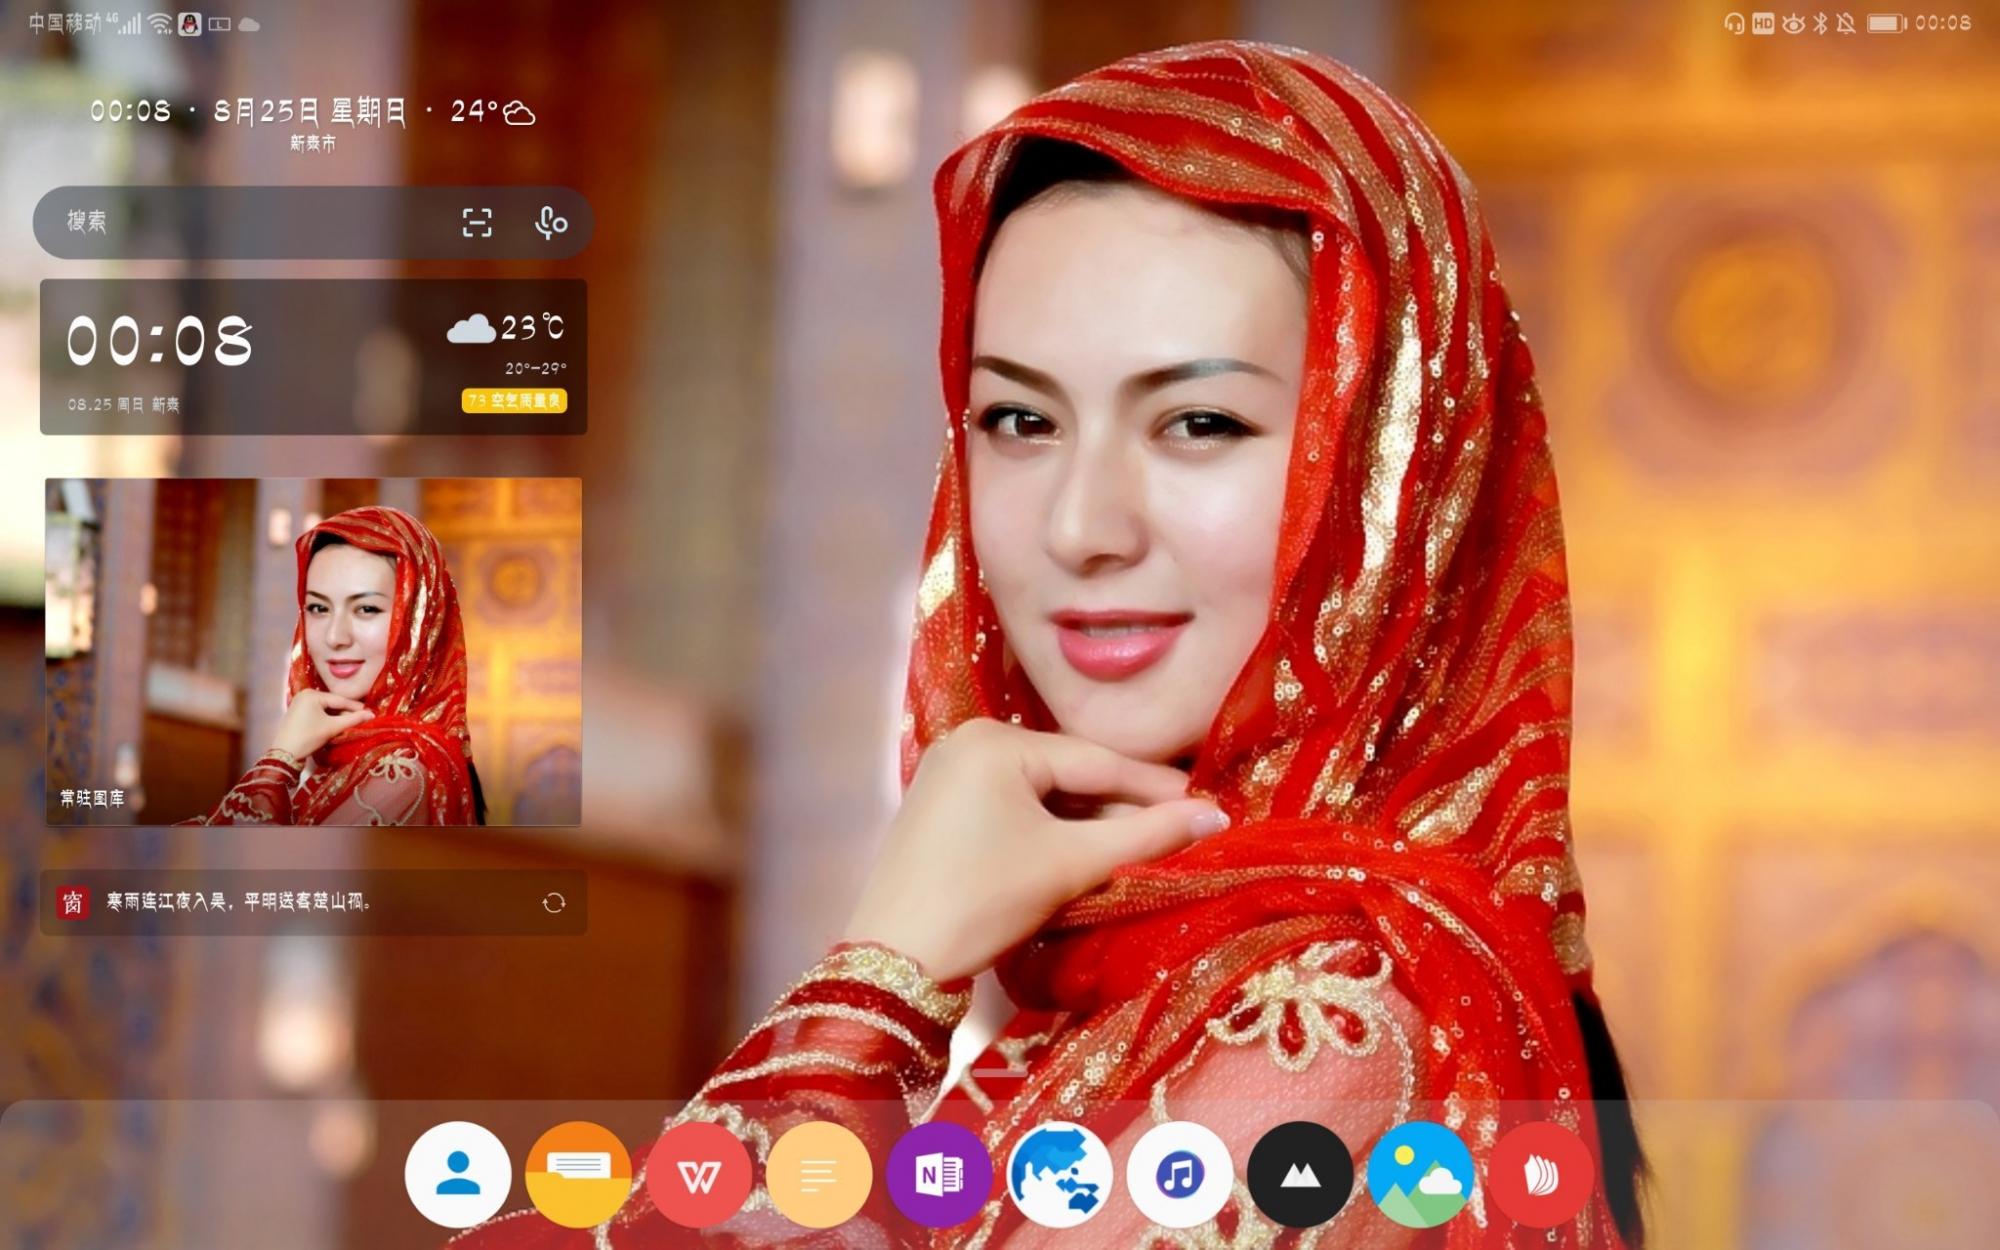 Screenshot_20190825_000836_com.microsoft.launcher.jpg